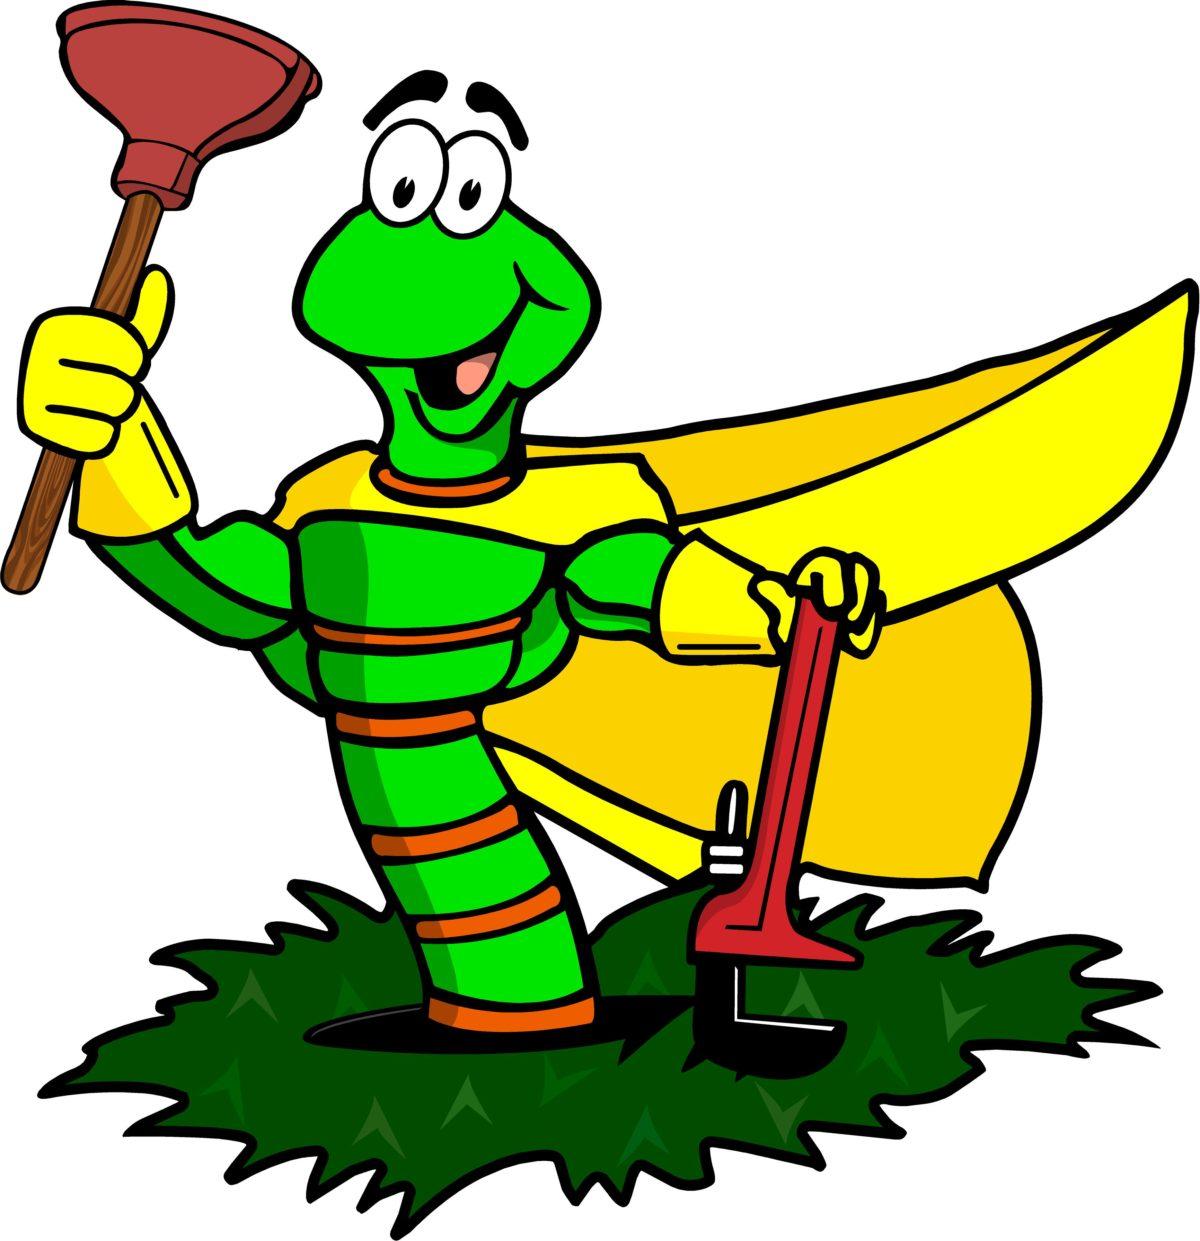 Cropped Earthworm Logo Jpg Earthworm Septic Services